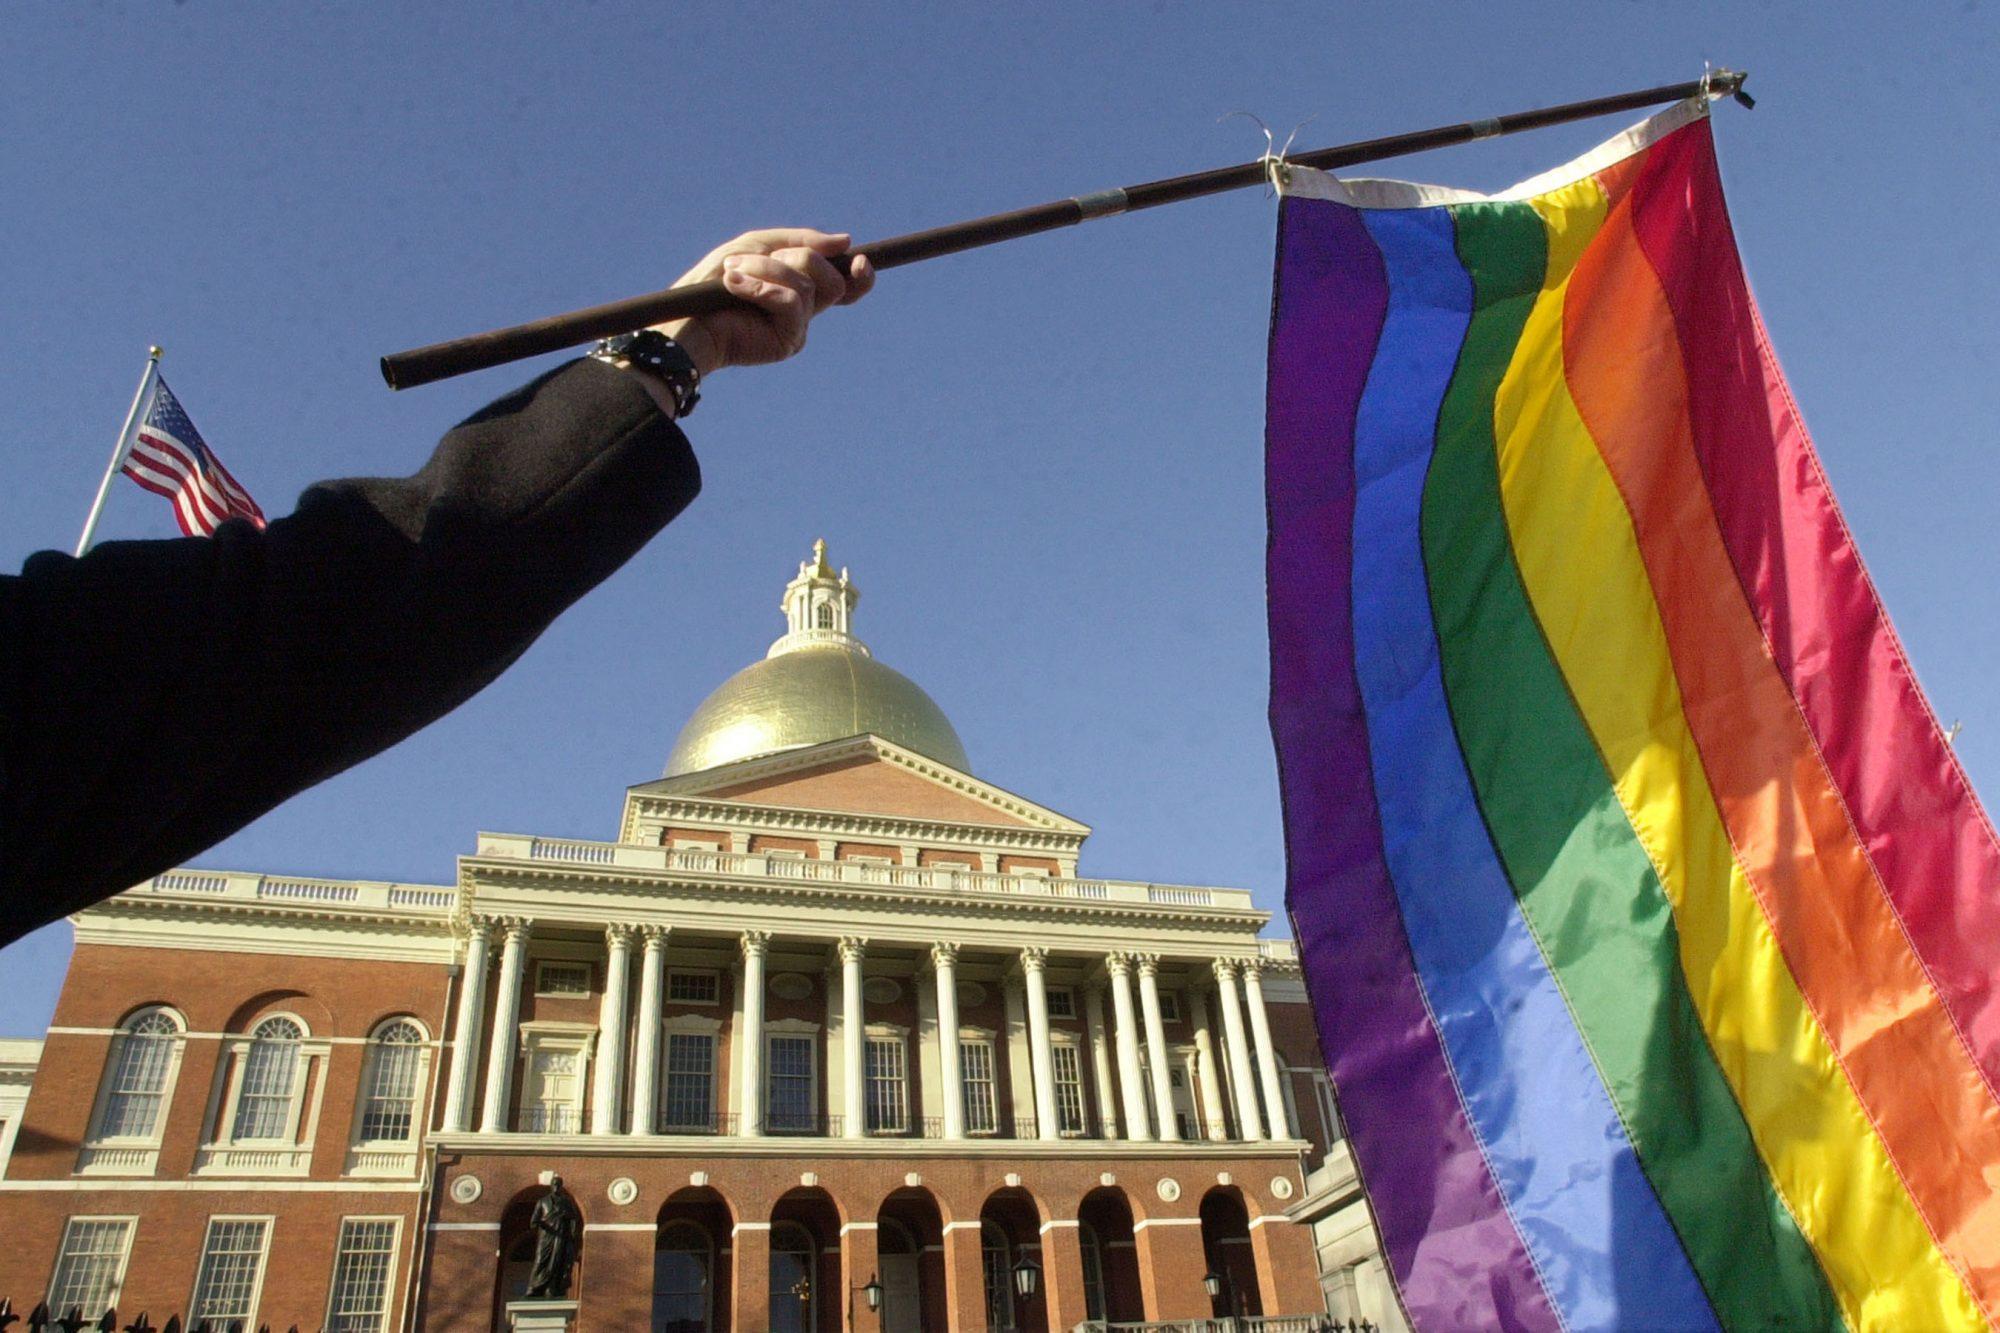 Gay Marriage Debate Continues In Boston